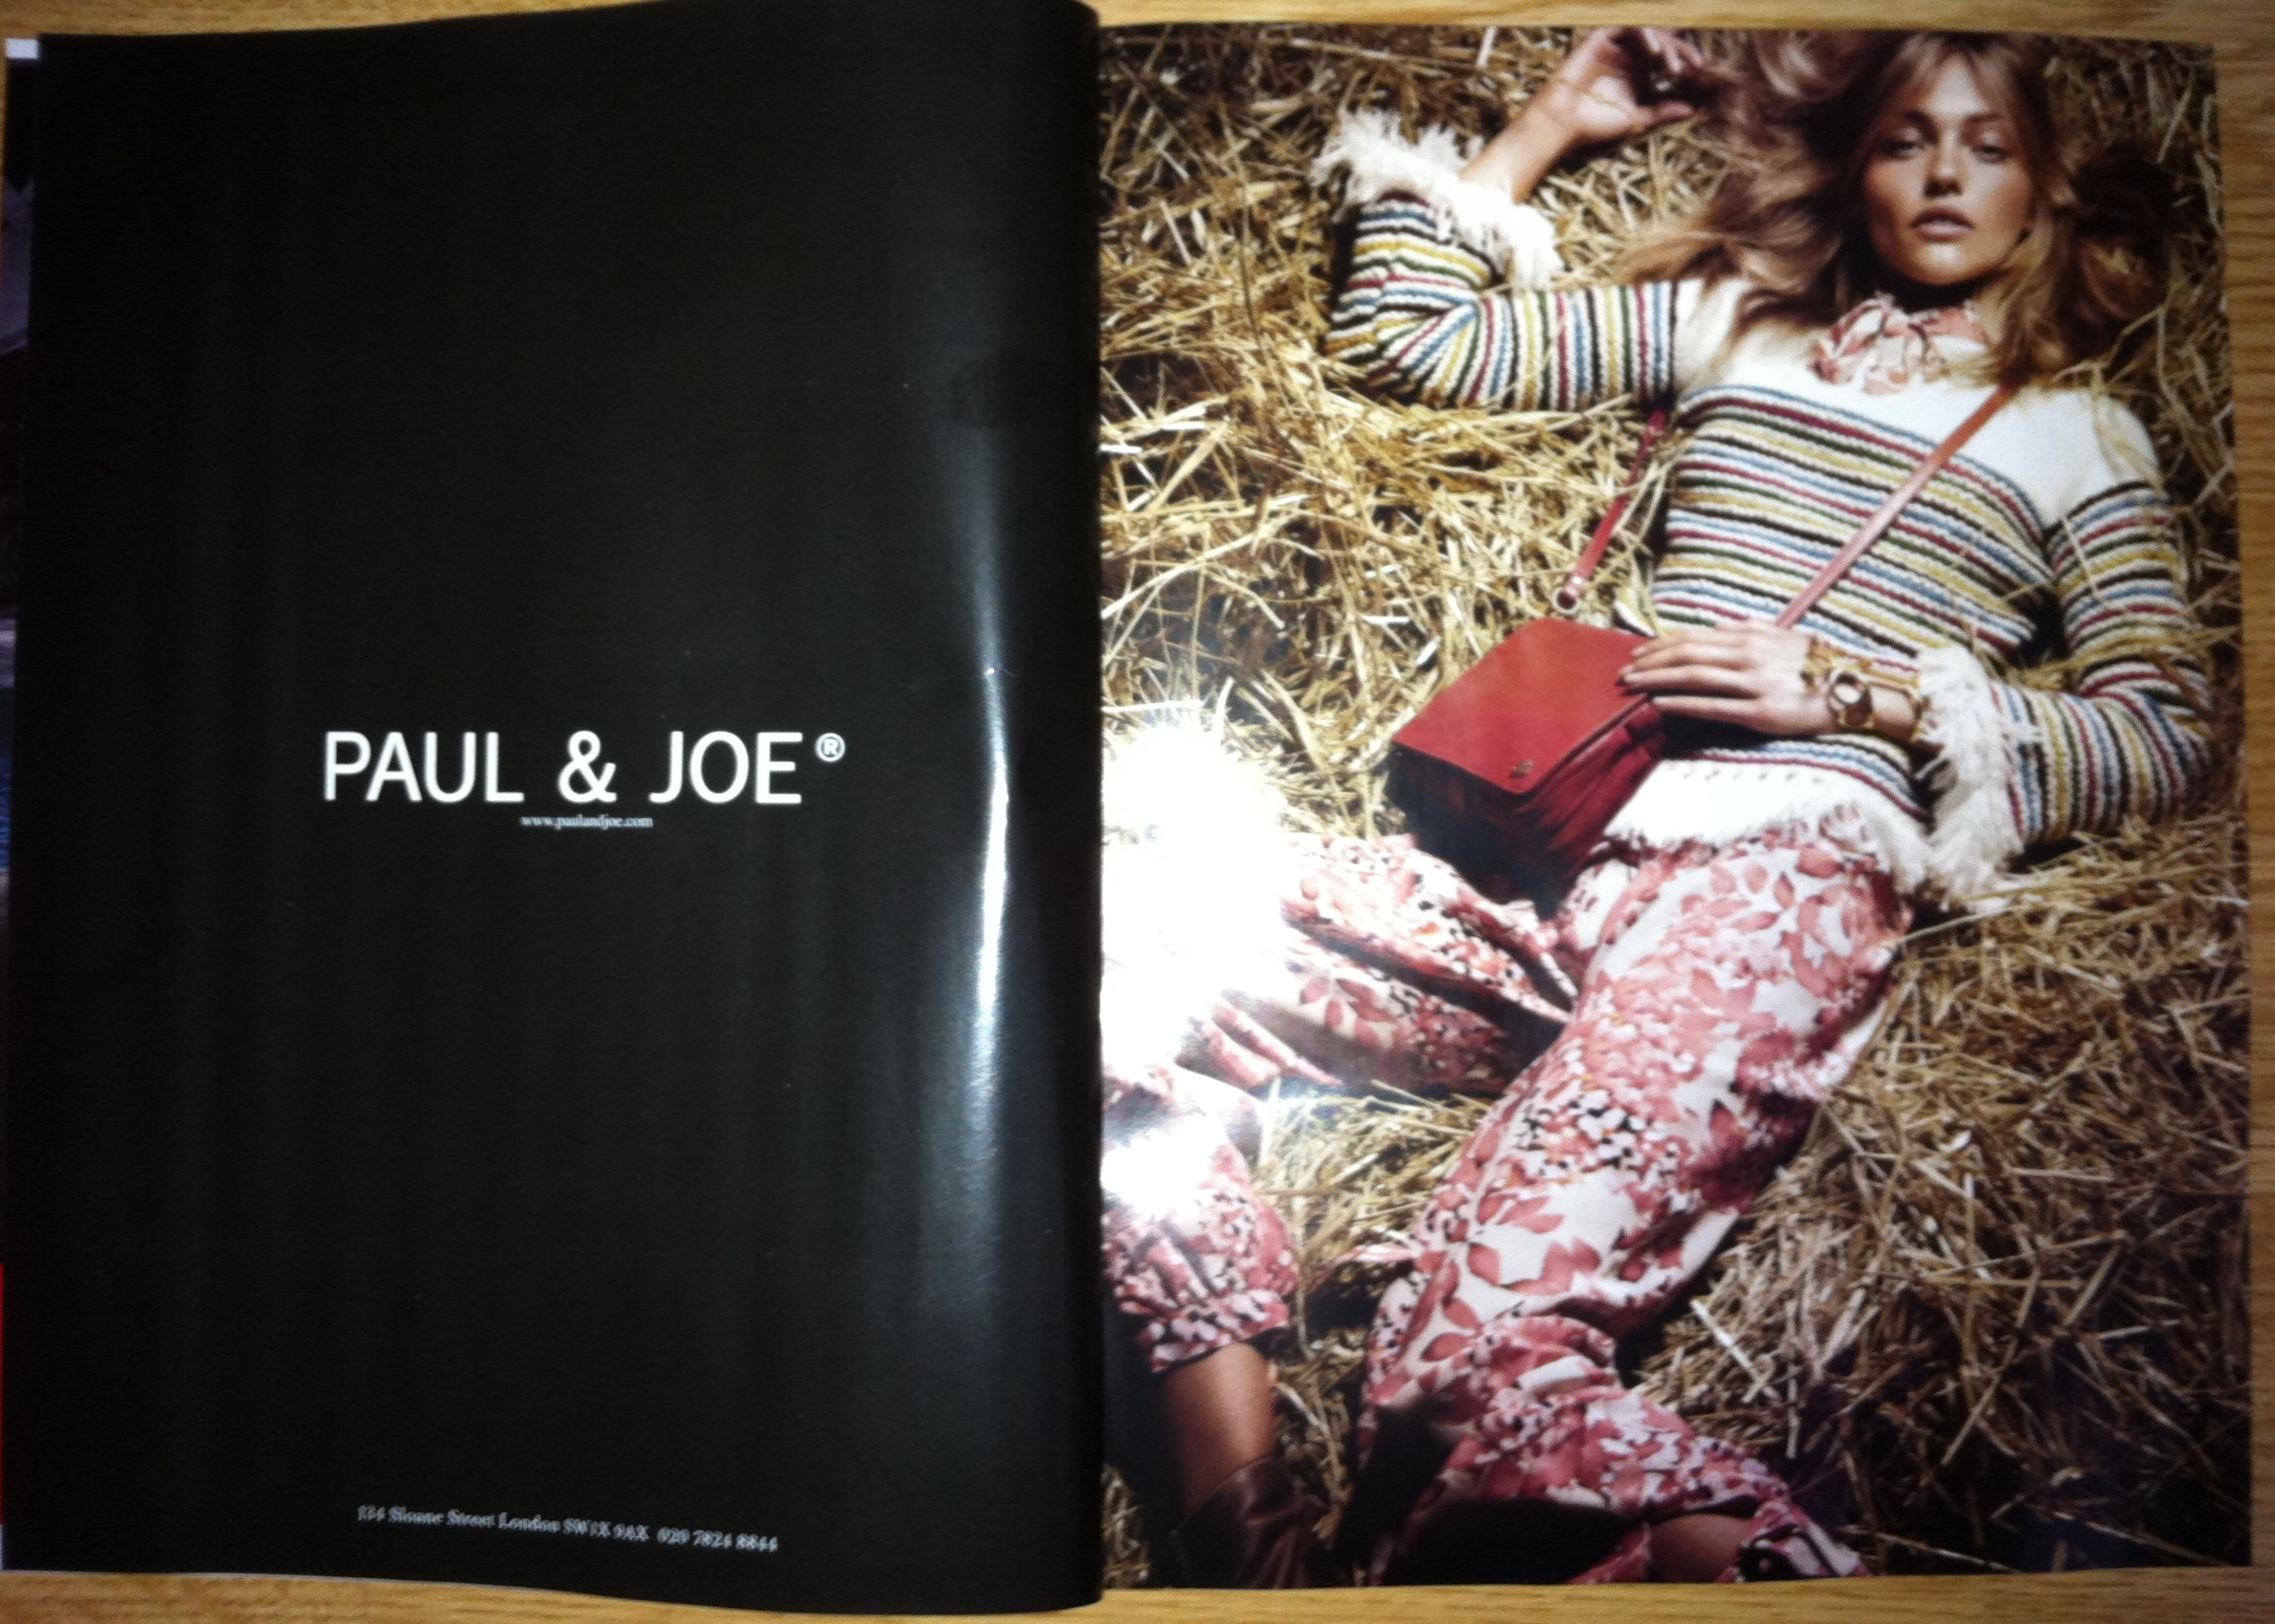 paul joe fall winter 2011 ad campaign art8amby 39 s blog. Black Bedroom Furniture Sets. Home Design Ideas